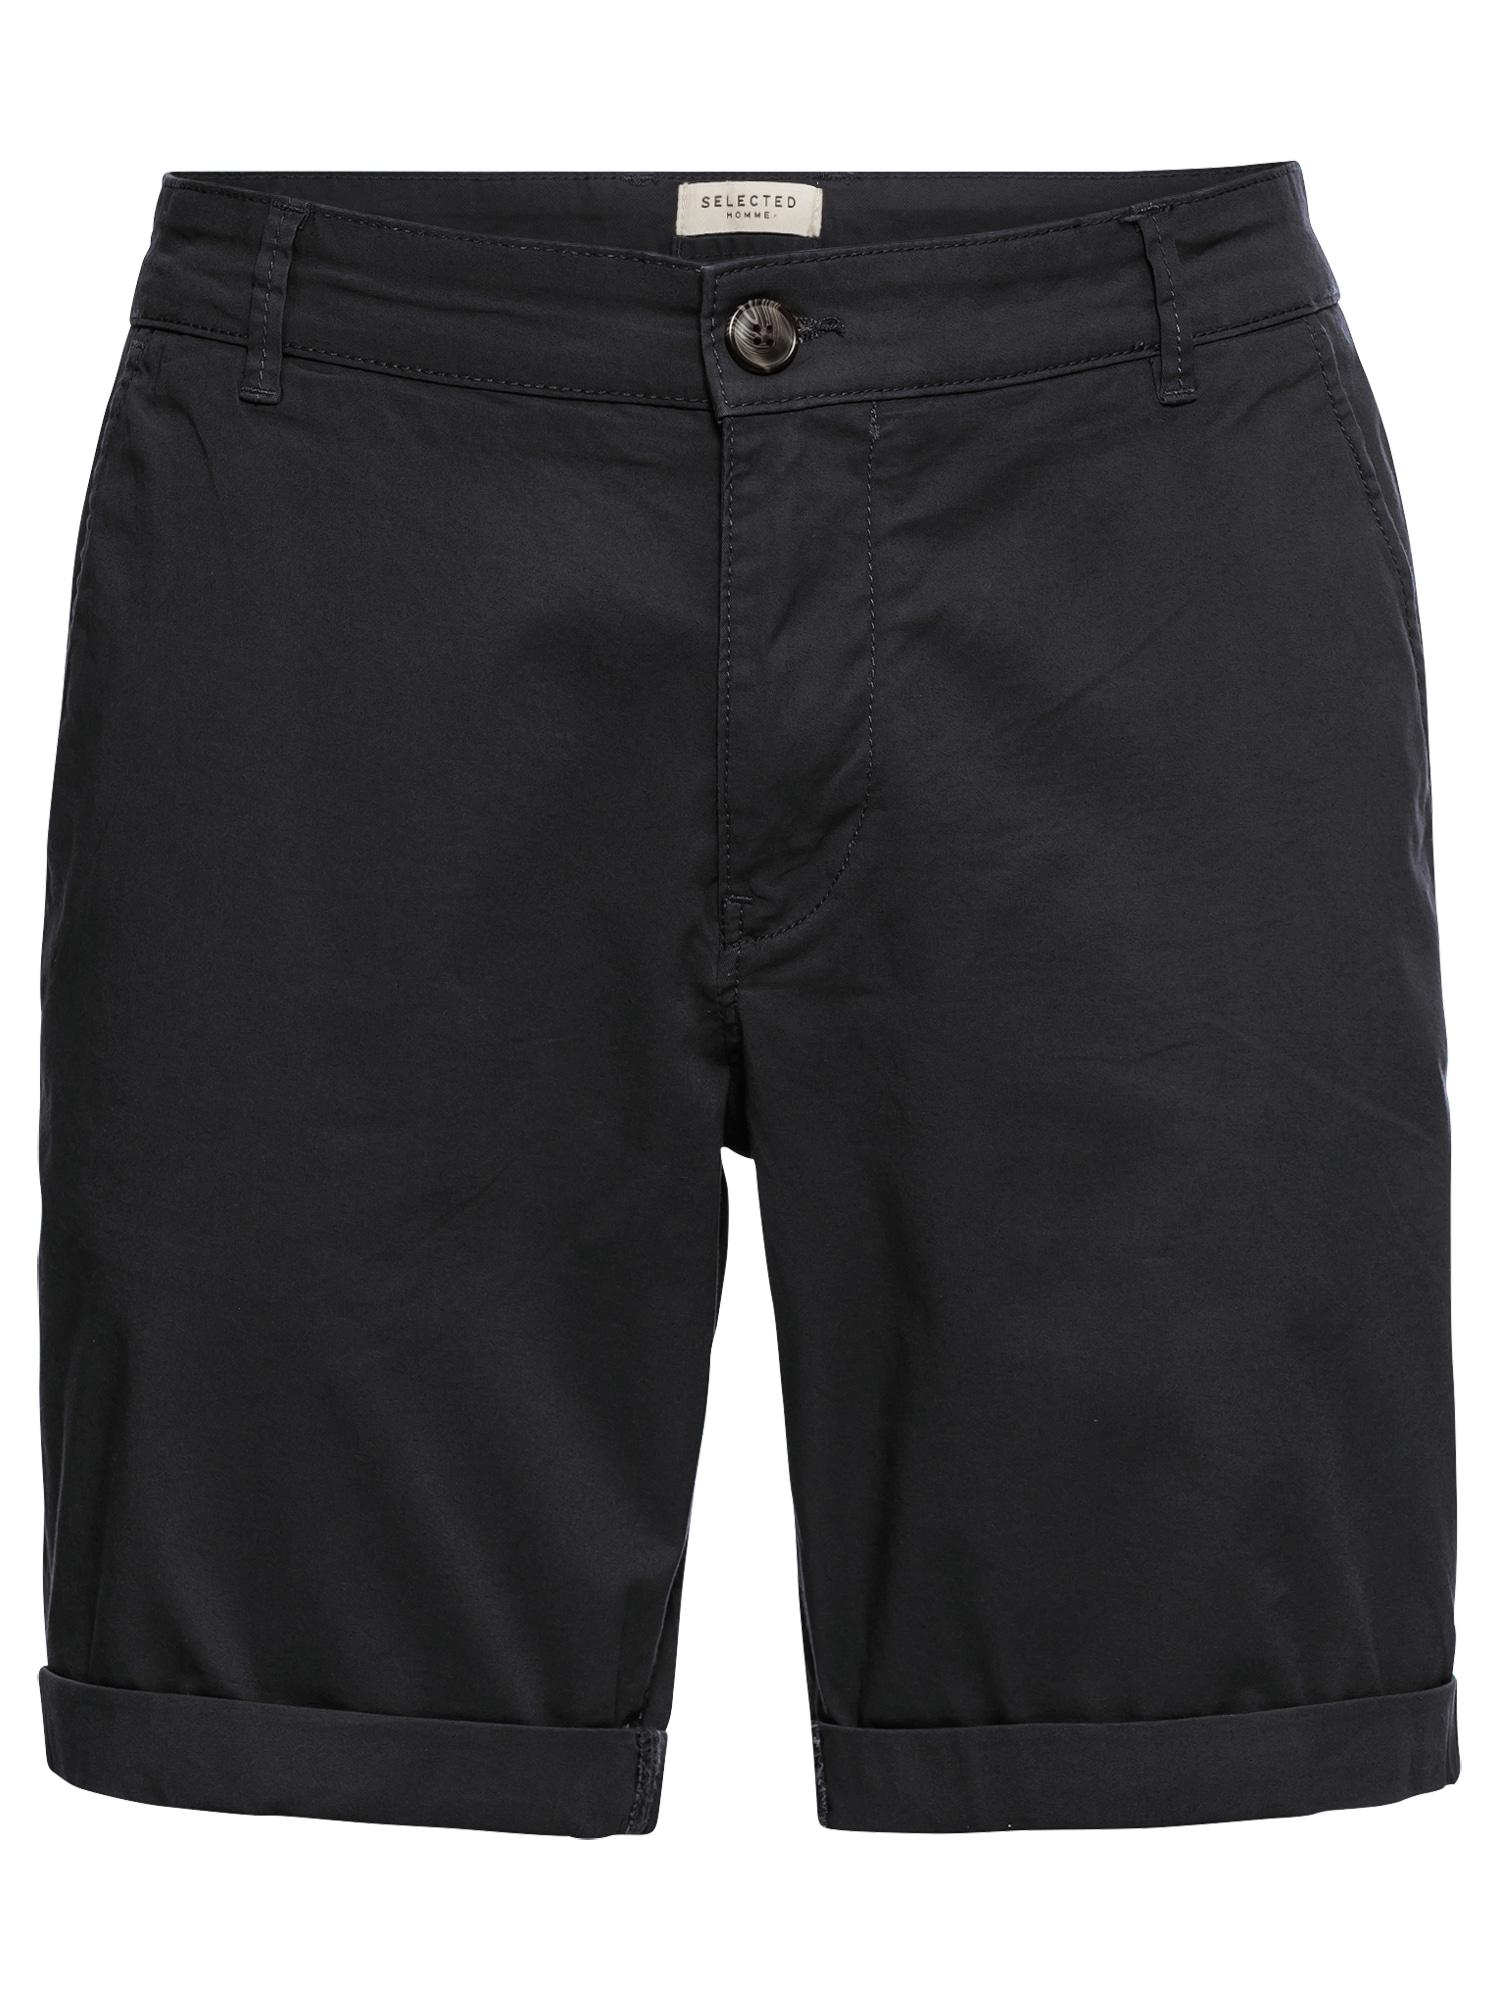 SELECTED HOMME Kelnės juoda